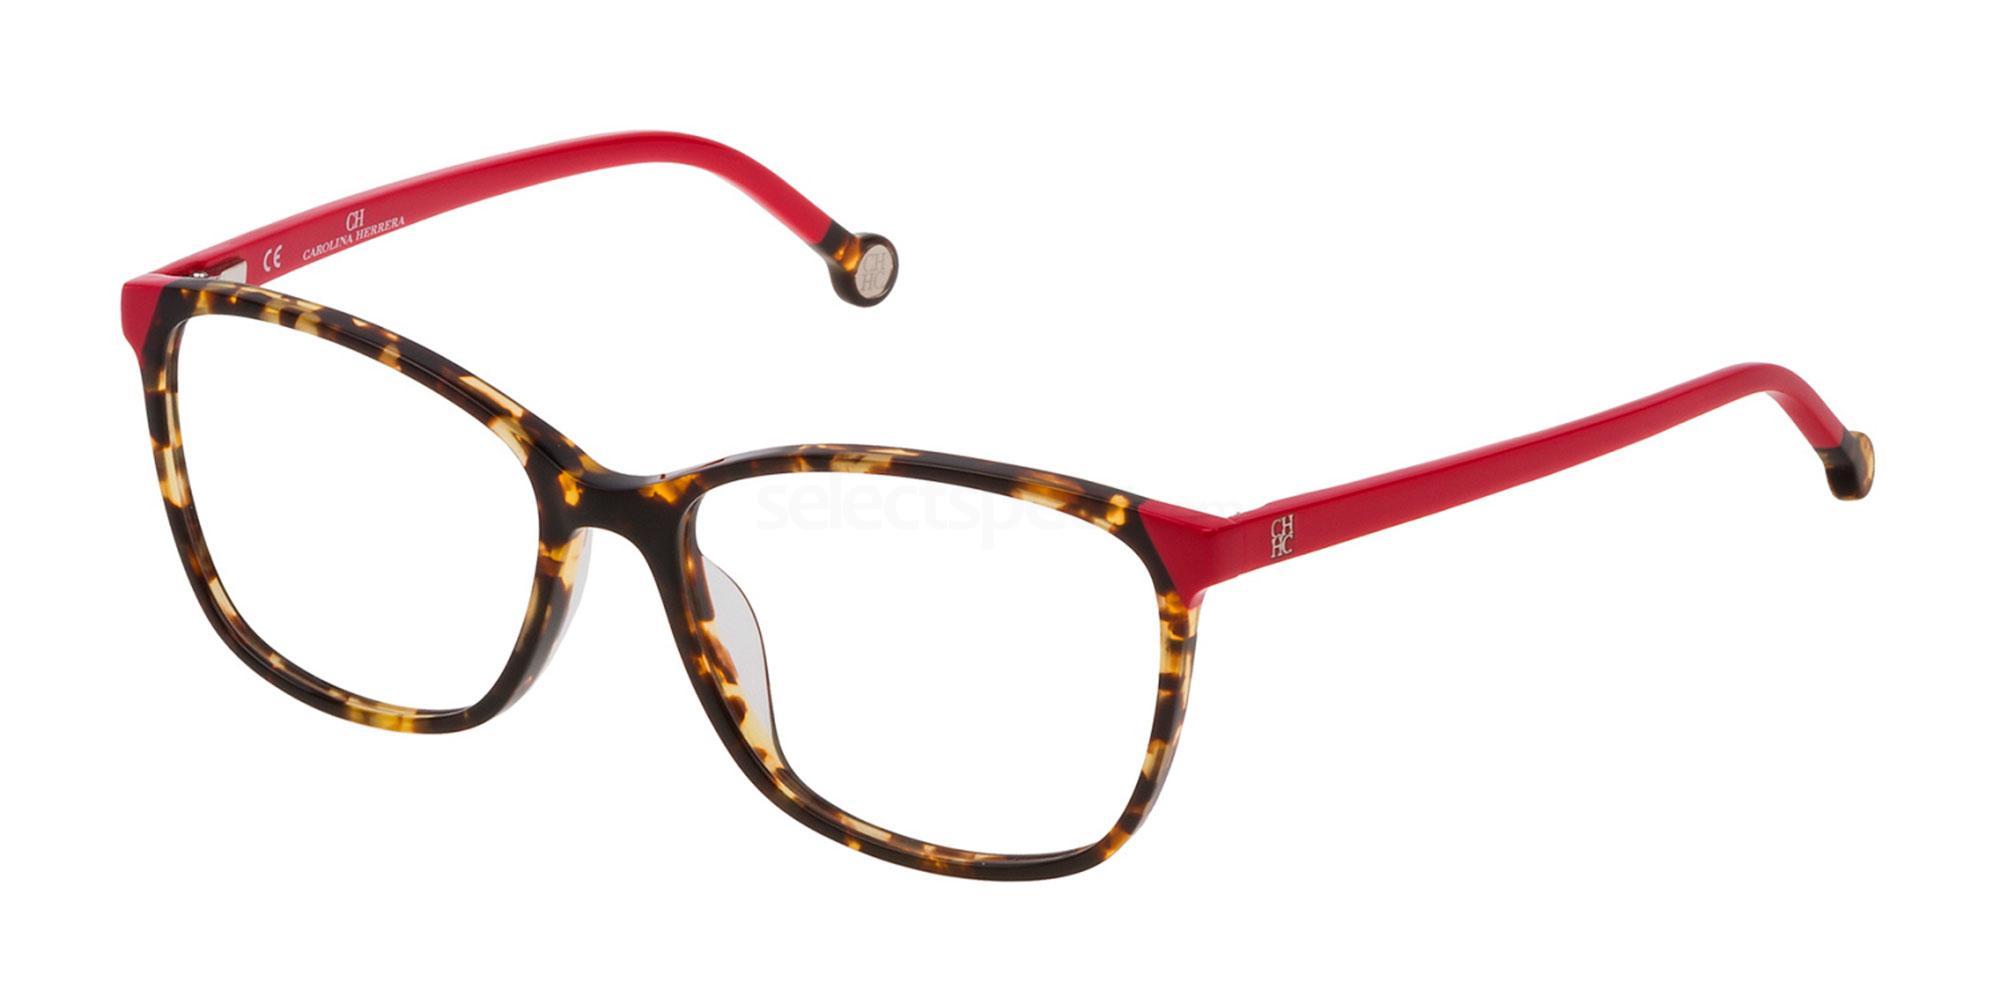 0741 VHE773 Glasses, CH Carolina Herrera